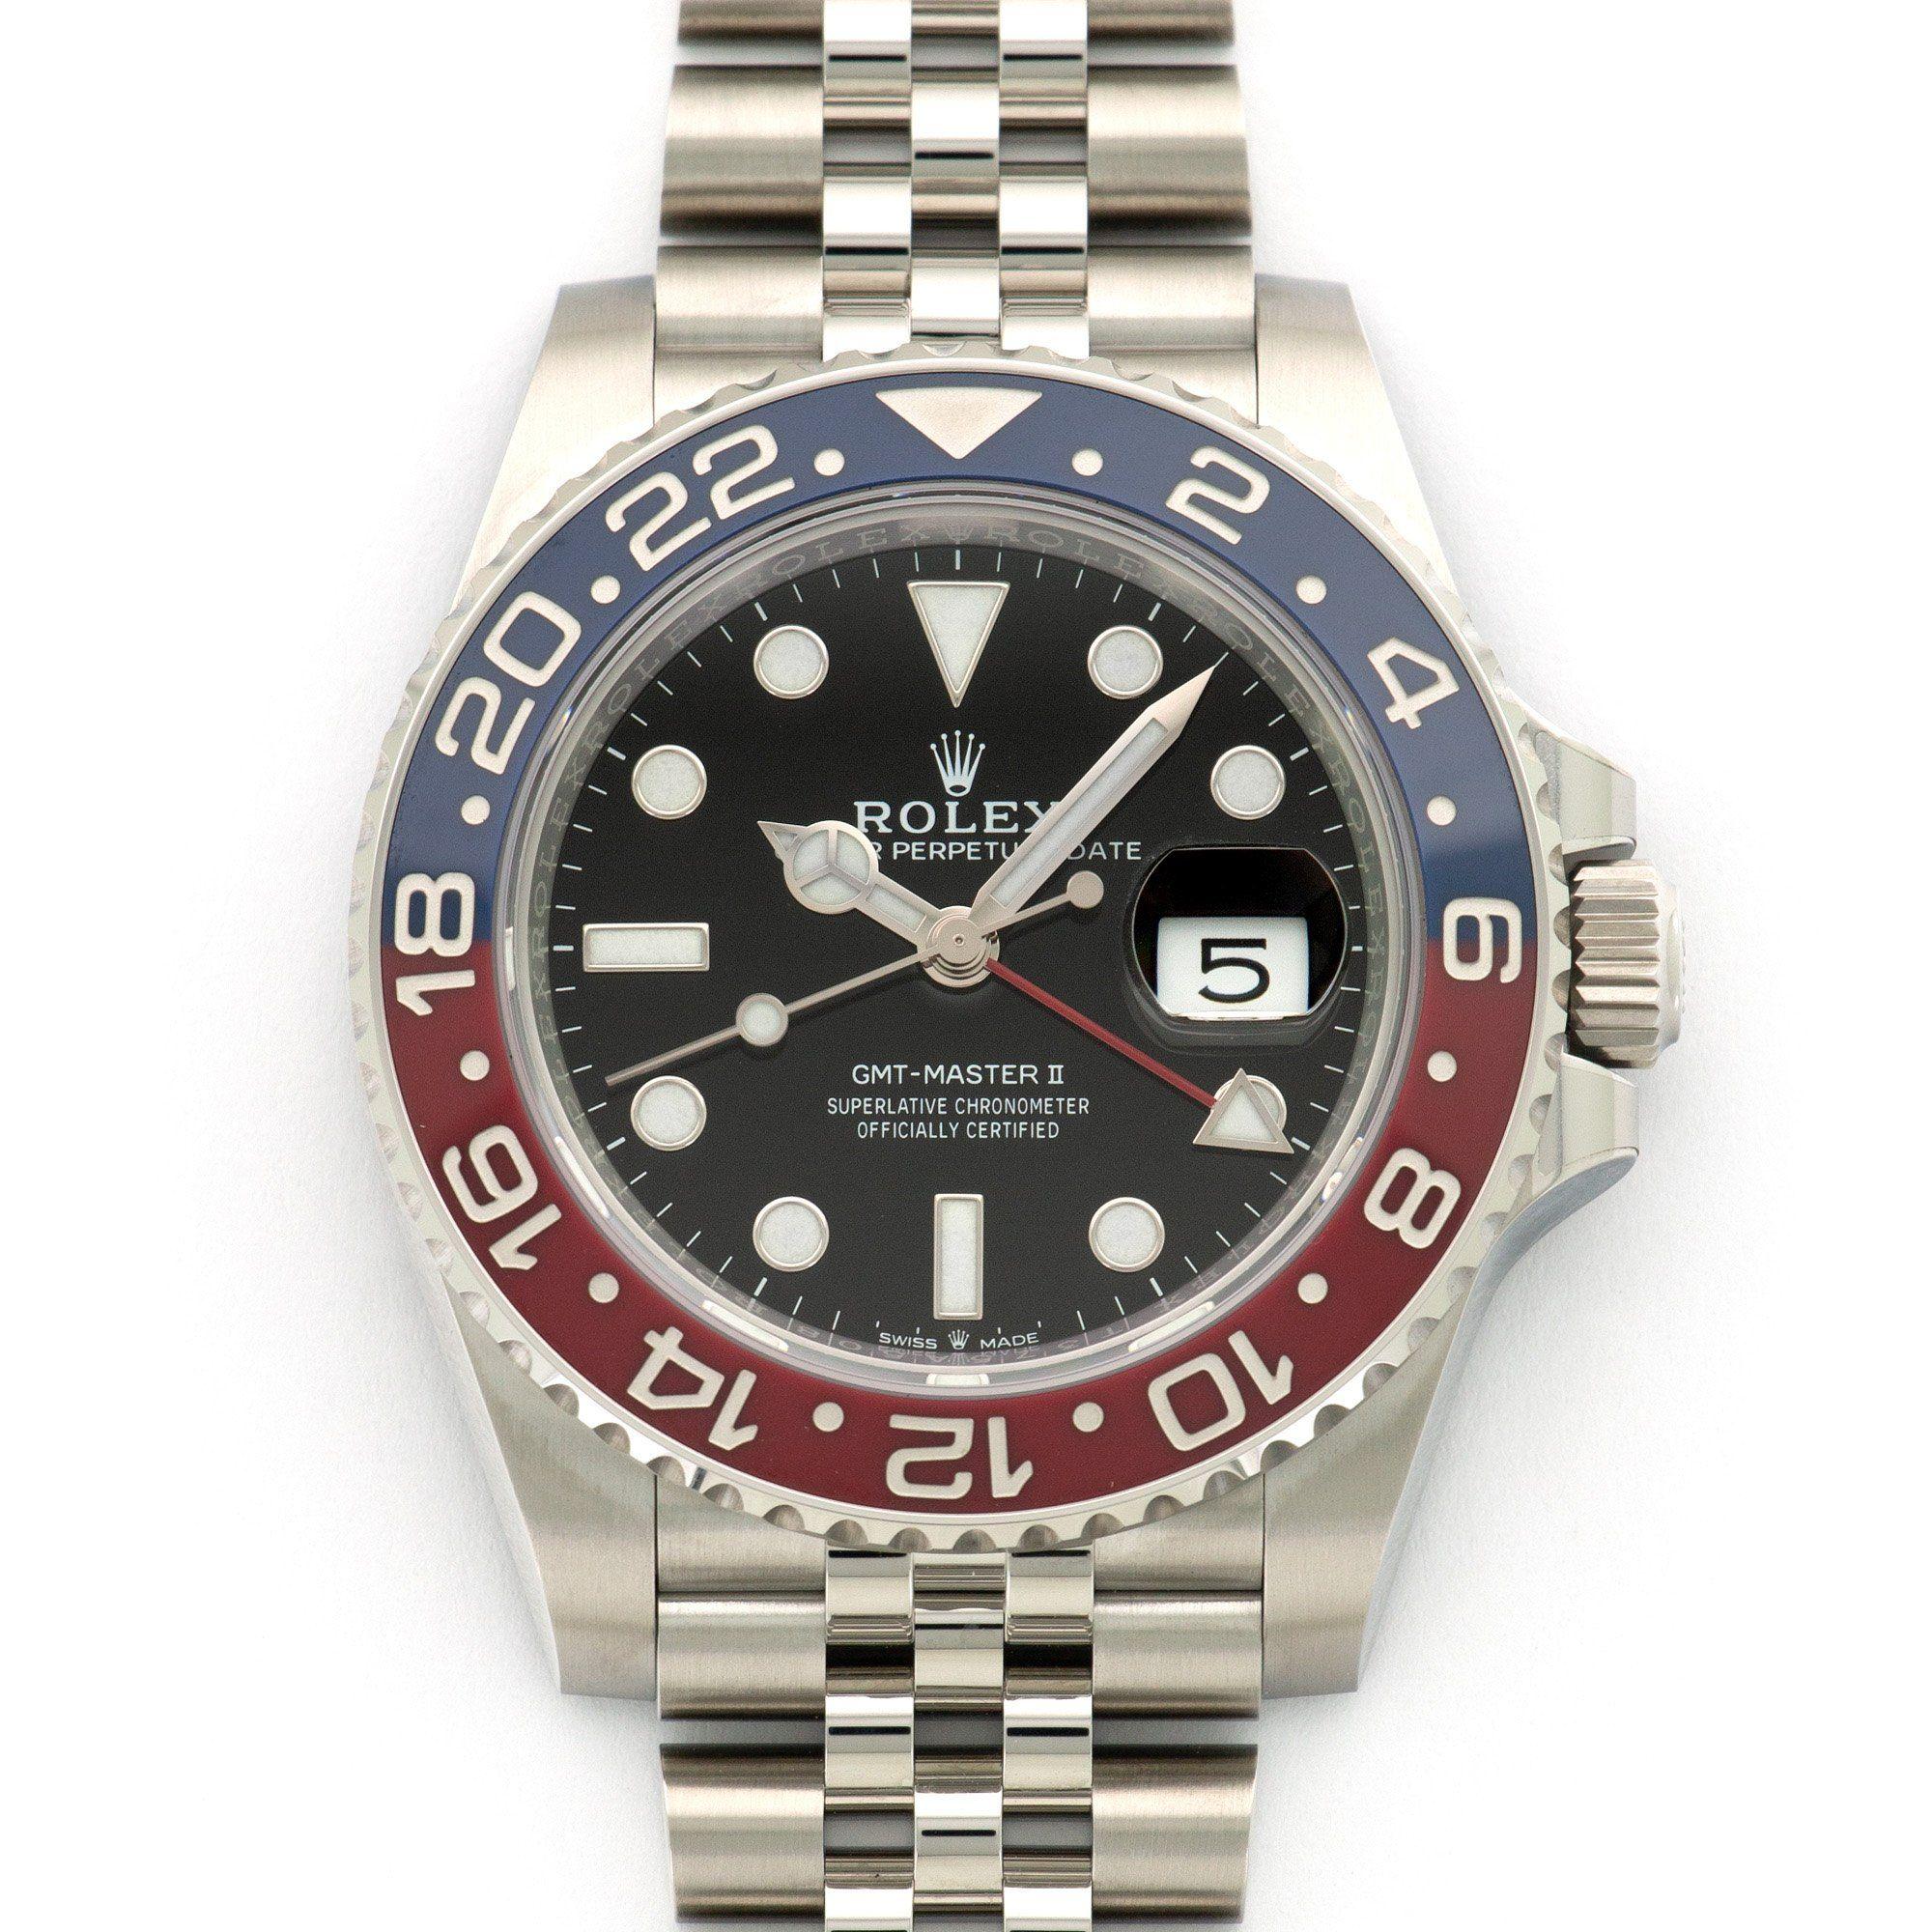 Rolex Gmt Master Ii Ceramic Pepsi Watch Ref 126710 Products Rolex Gmt Master Rolex Gmt Rolex